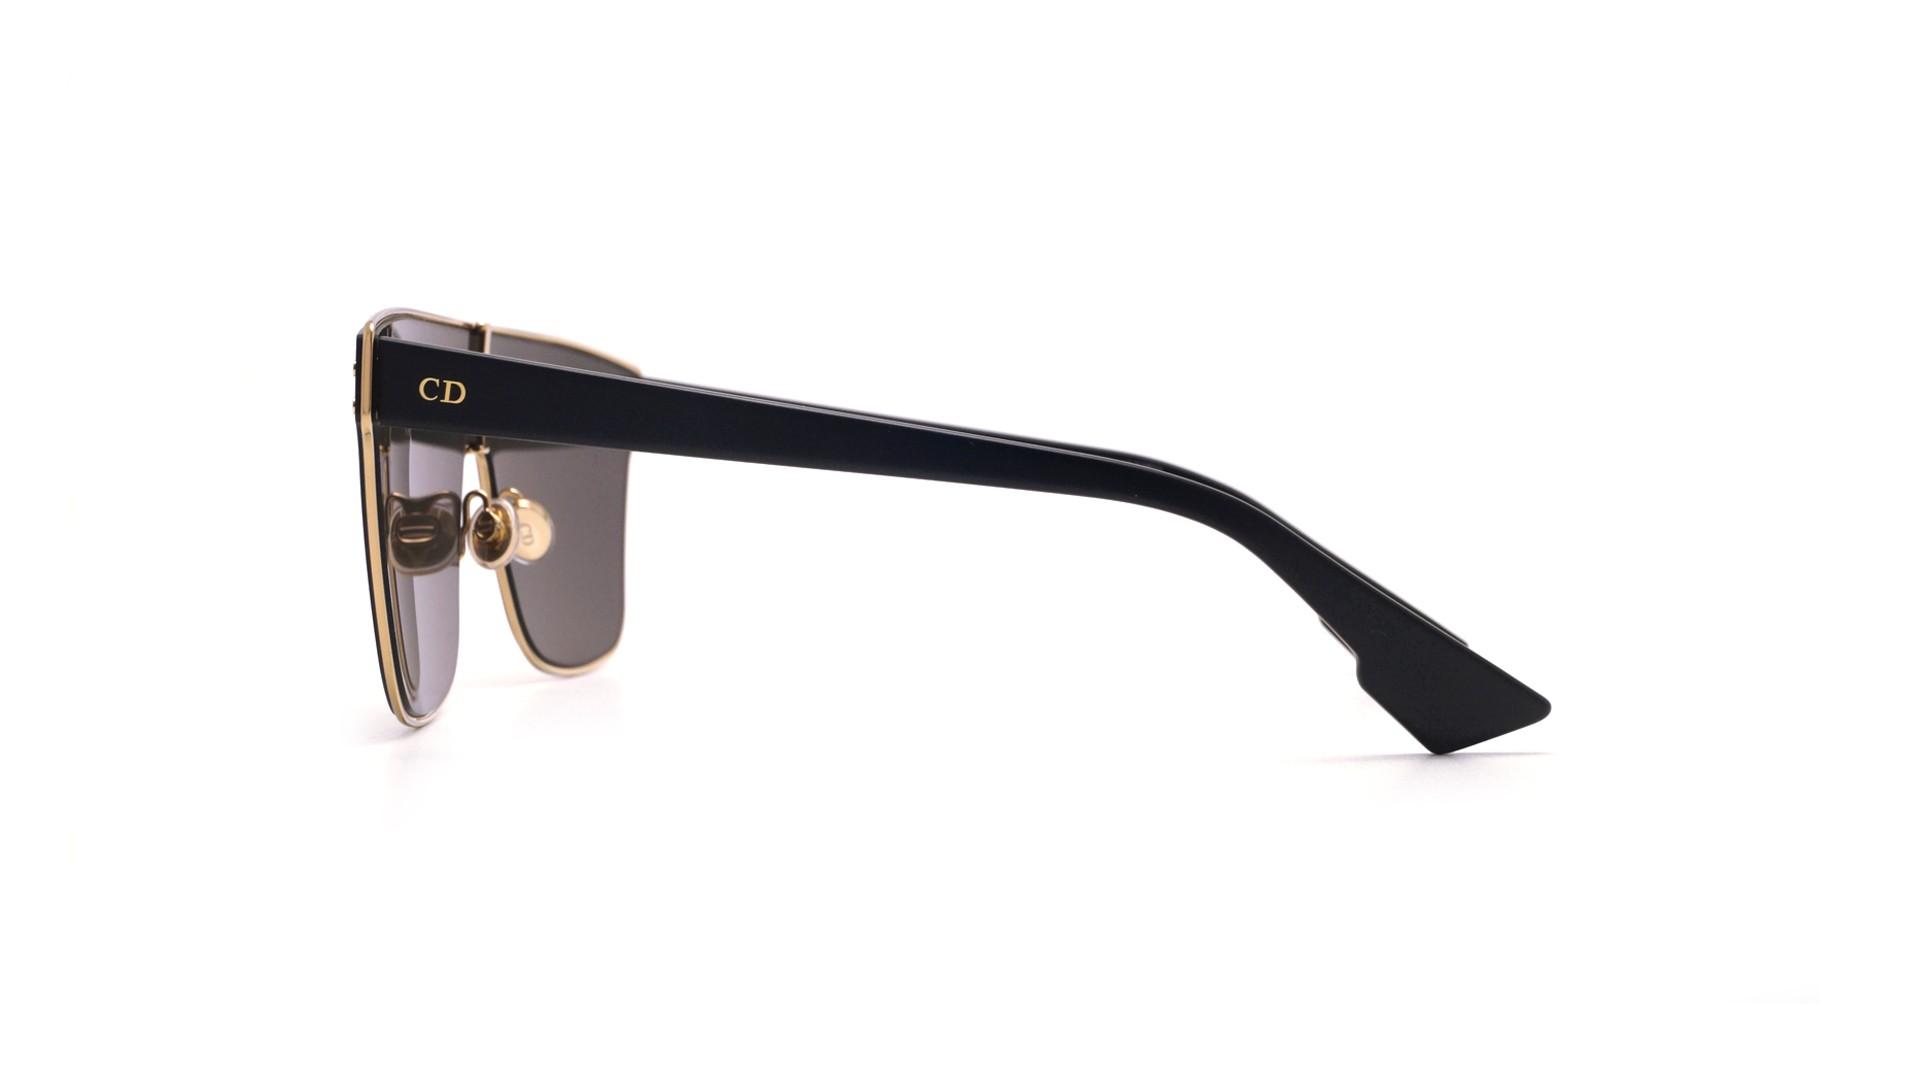 aa4883ab882f7 Sunglasses Dior Izon 1 Gold DIORIZON1 2M2QV 99-01 Large Flash